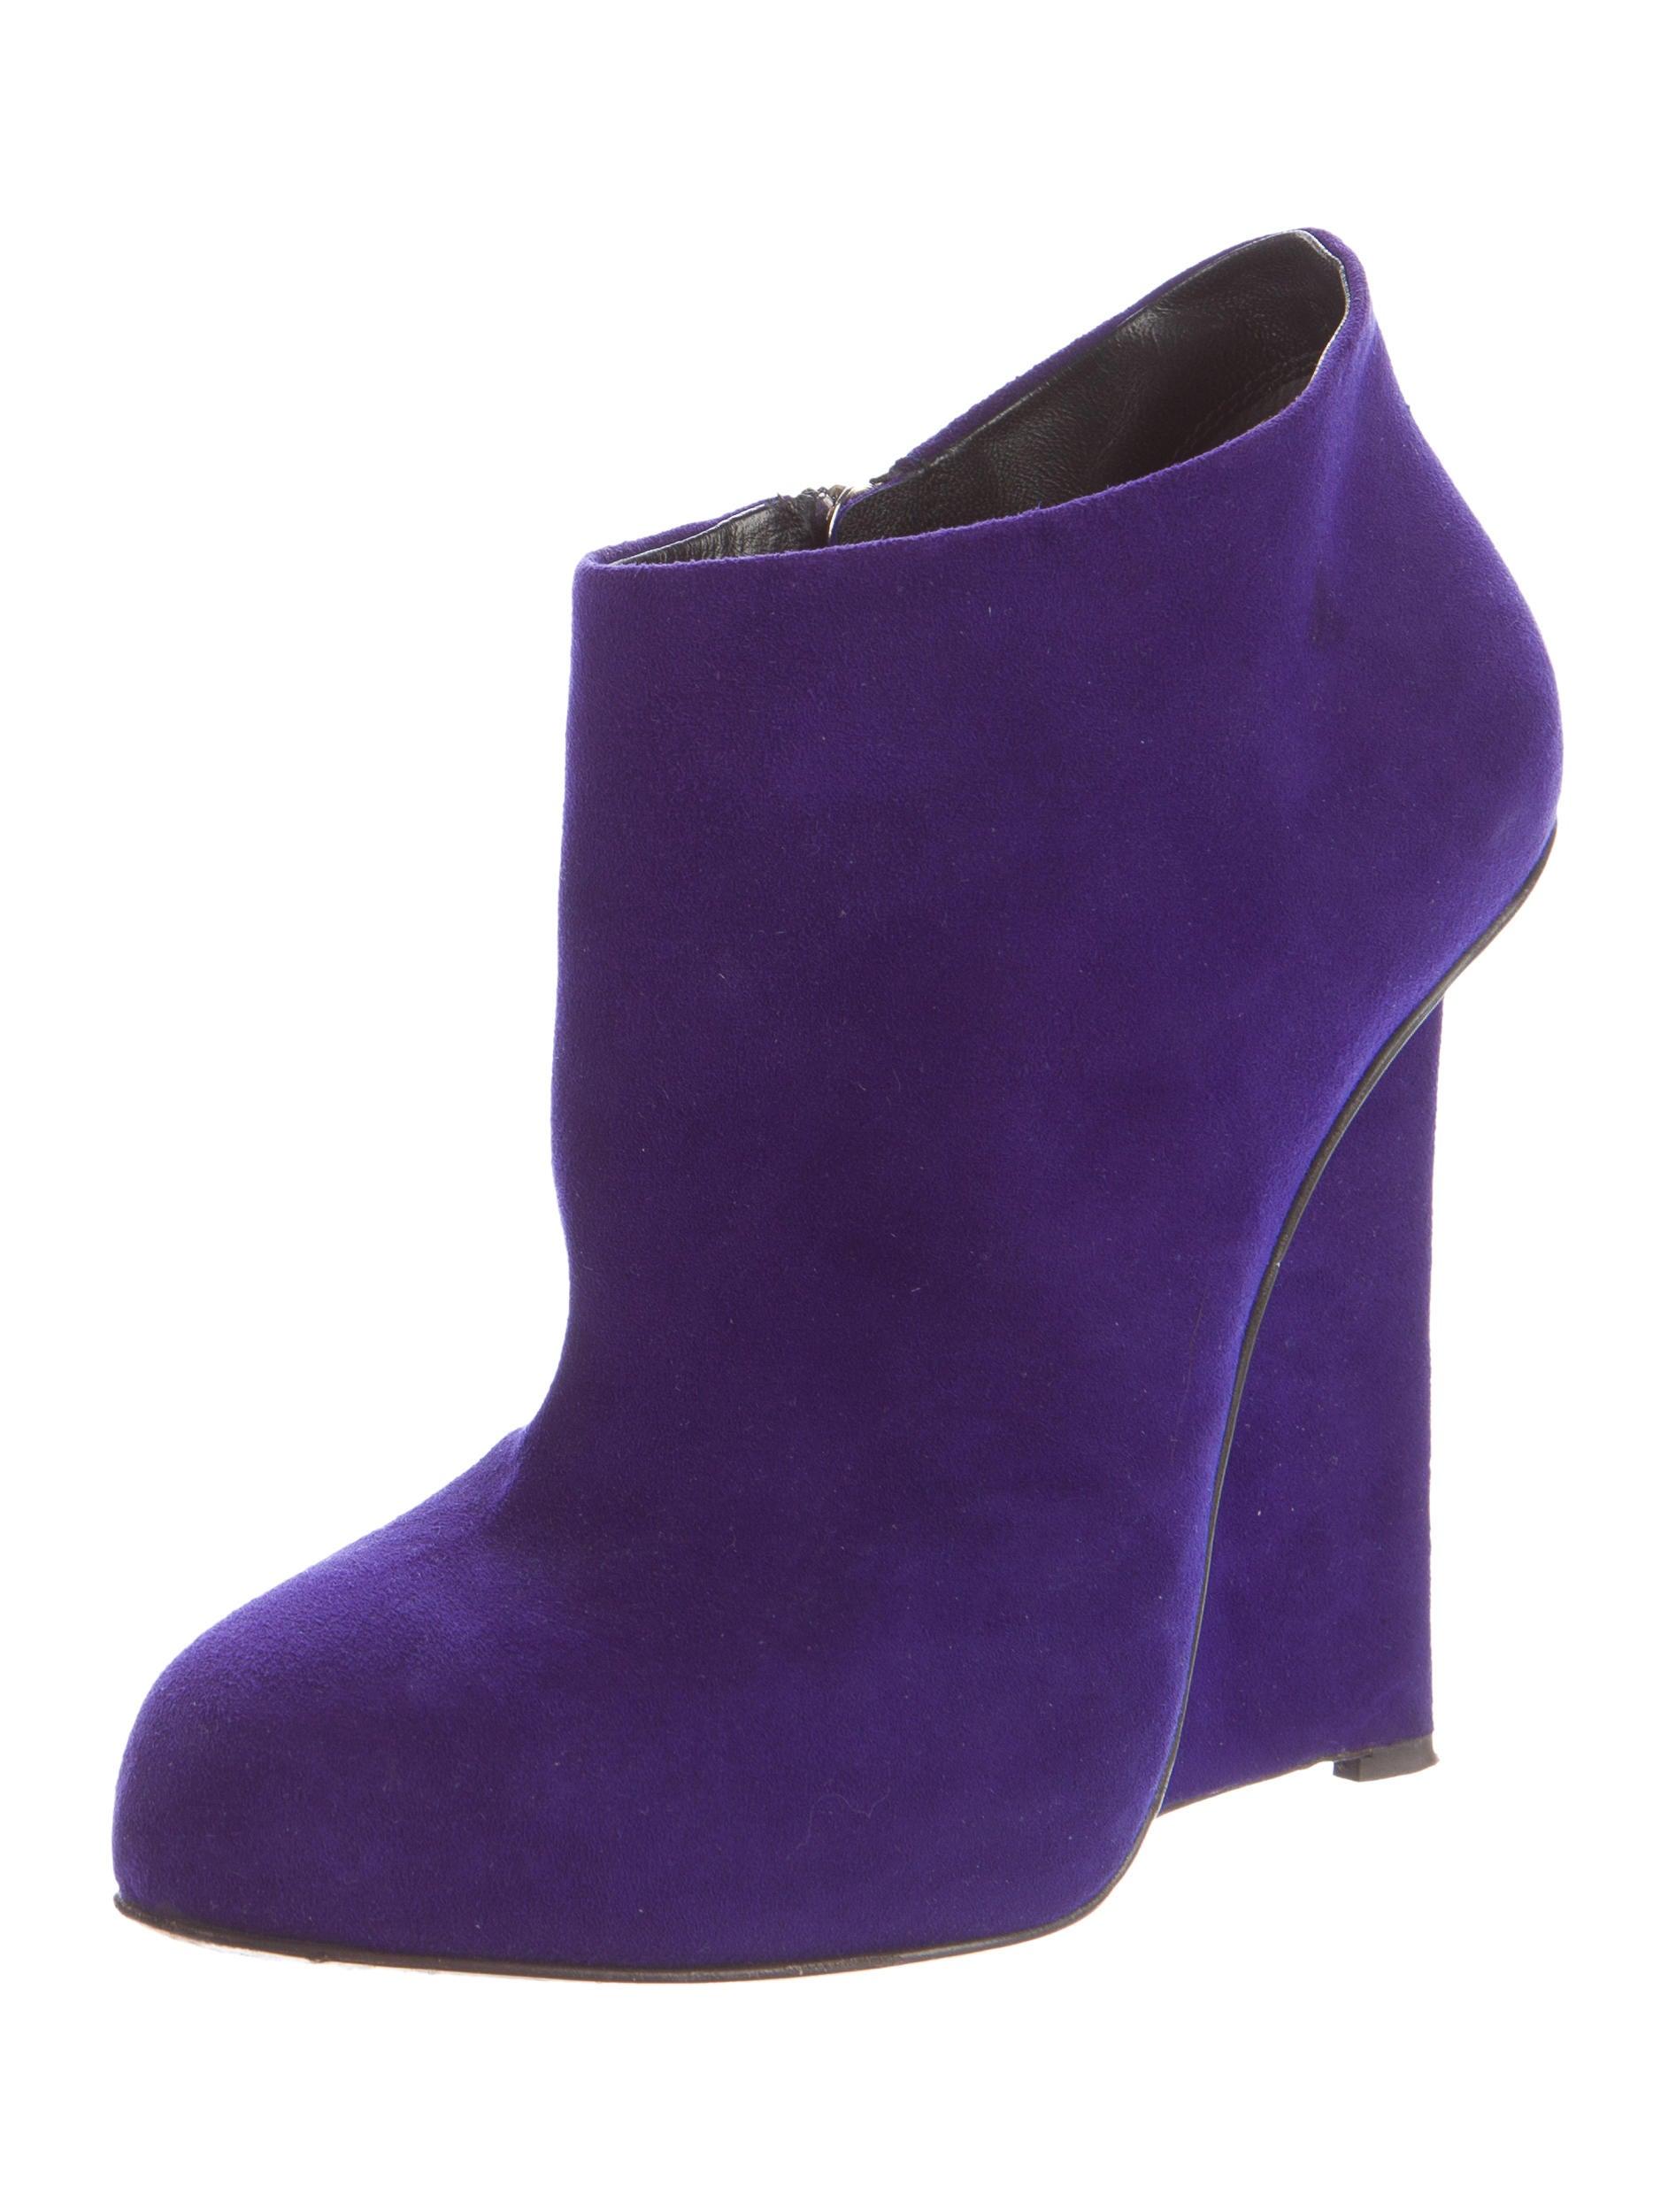 giuseppe zanotti suede wedge boots shoes giu35270